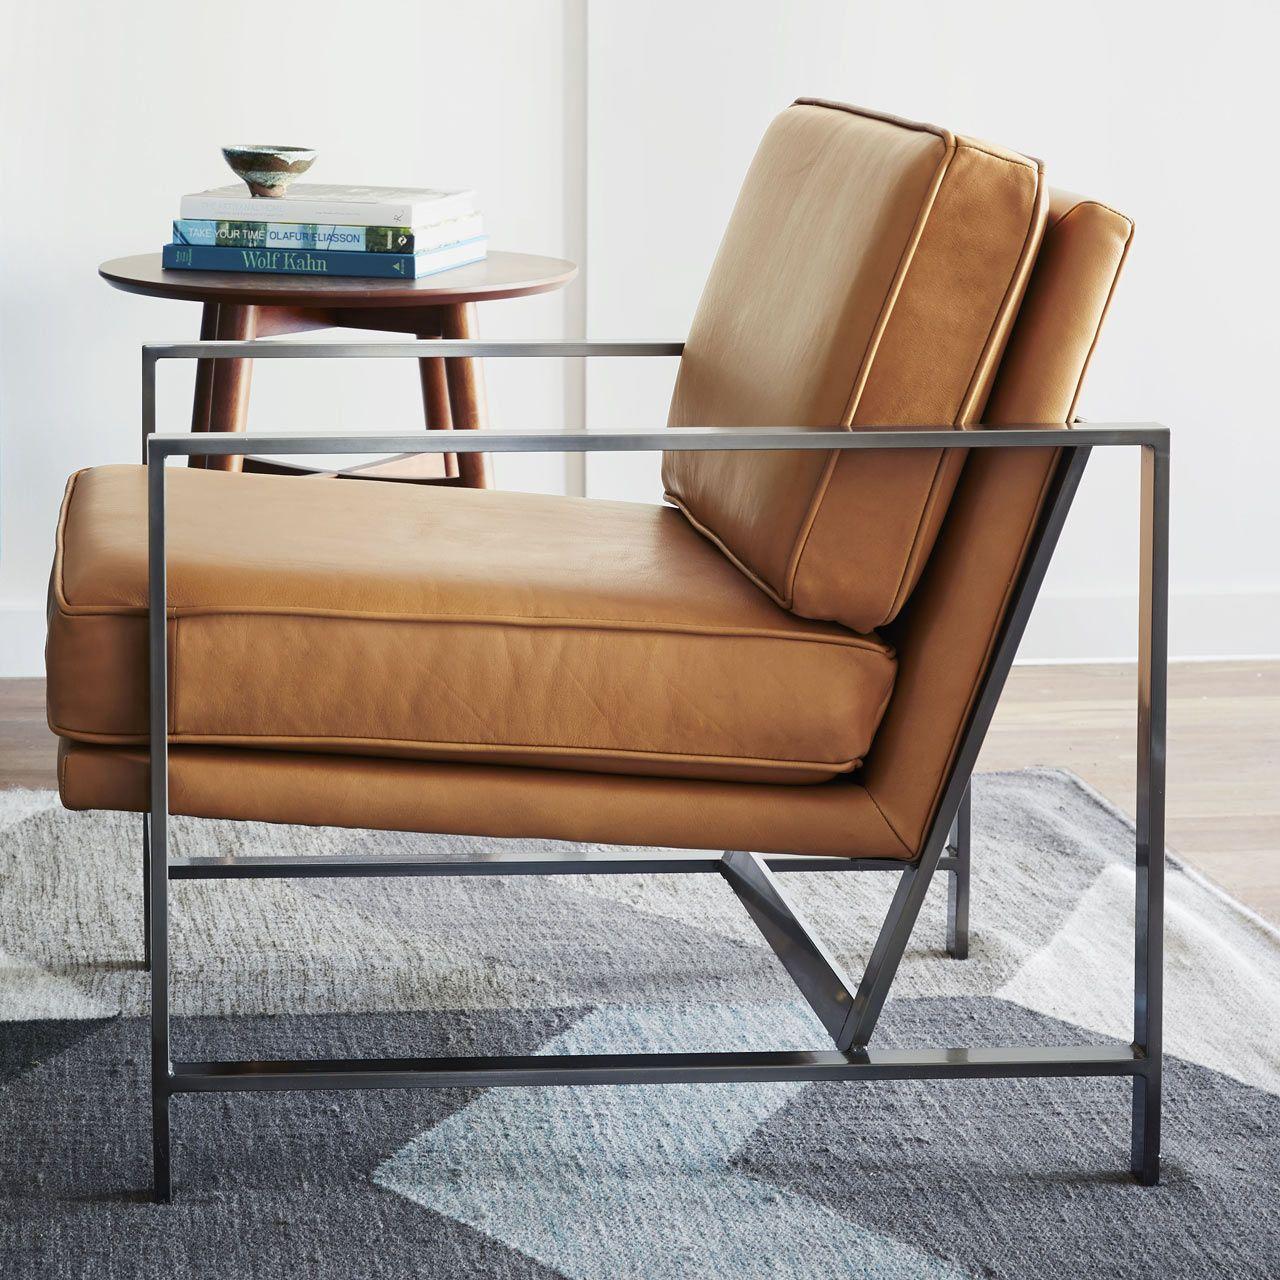 West-Elm-Workspace-15-industrial   furniture   Pinterest